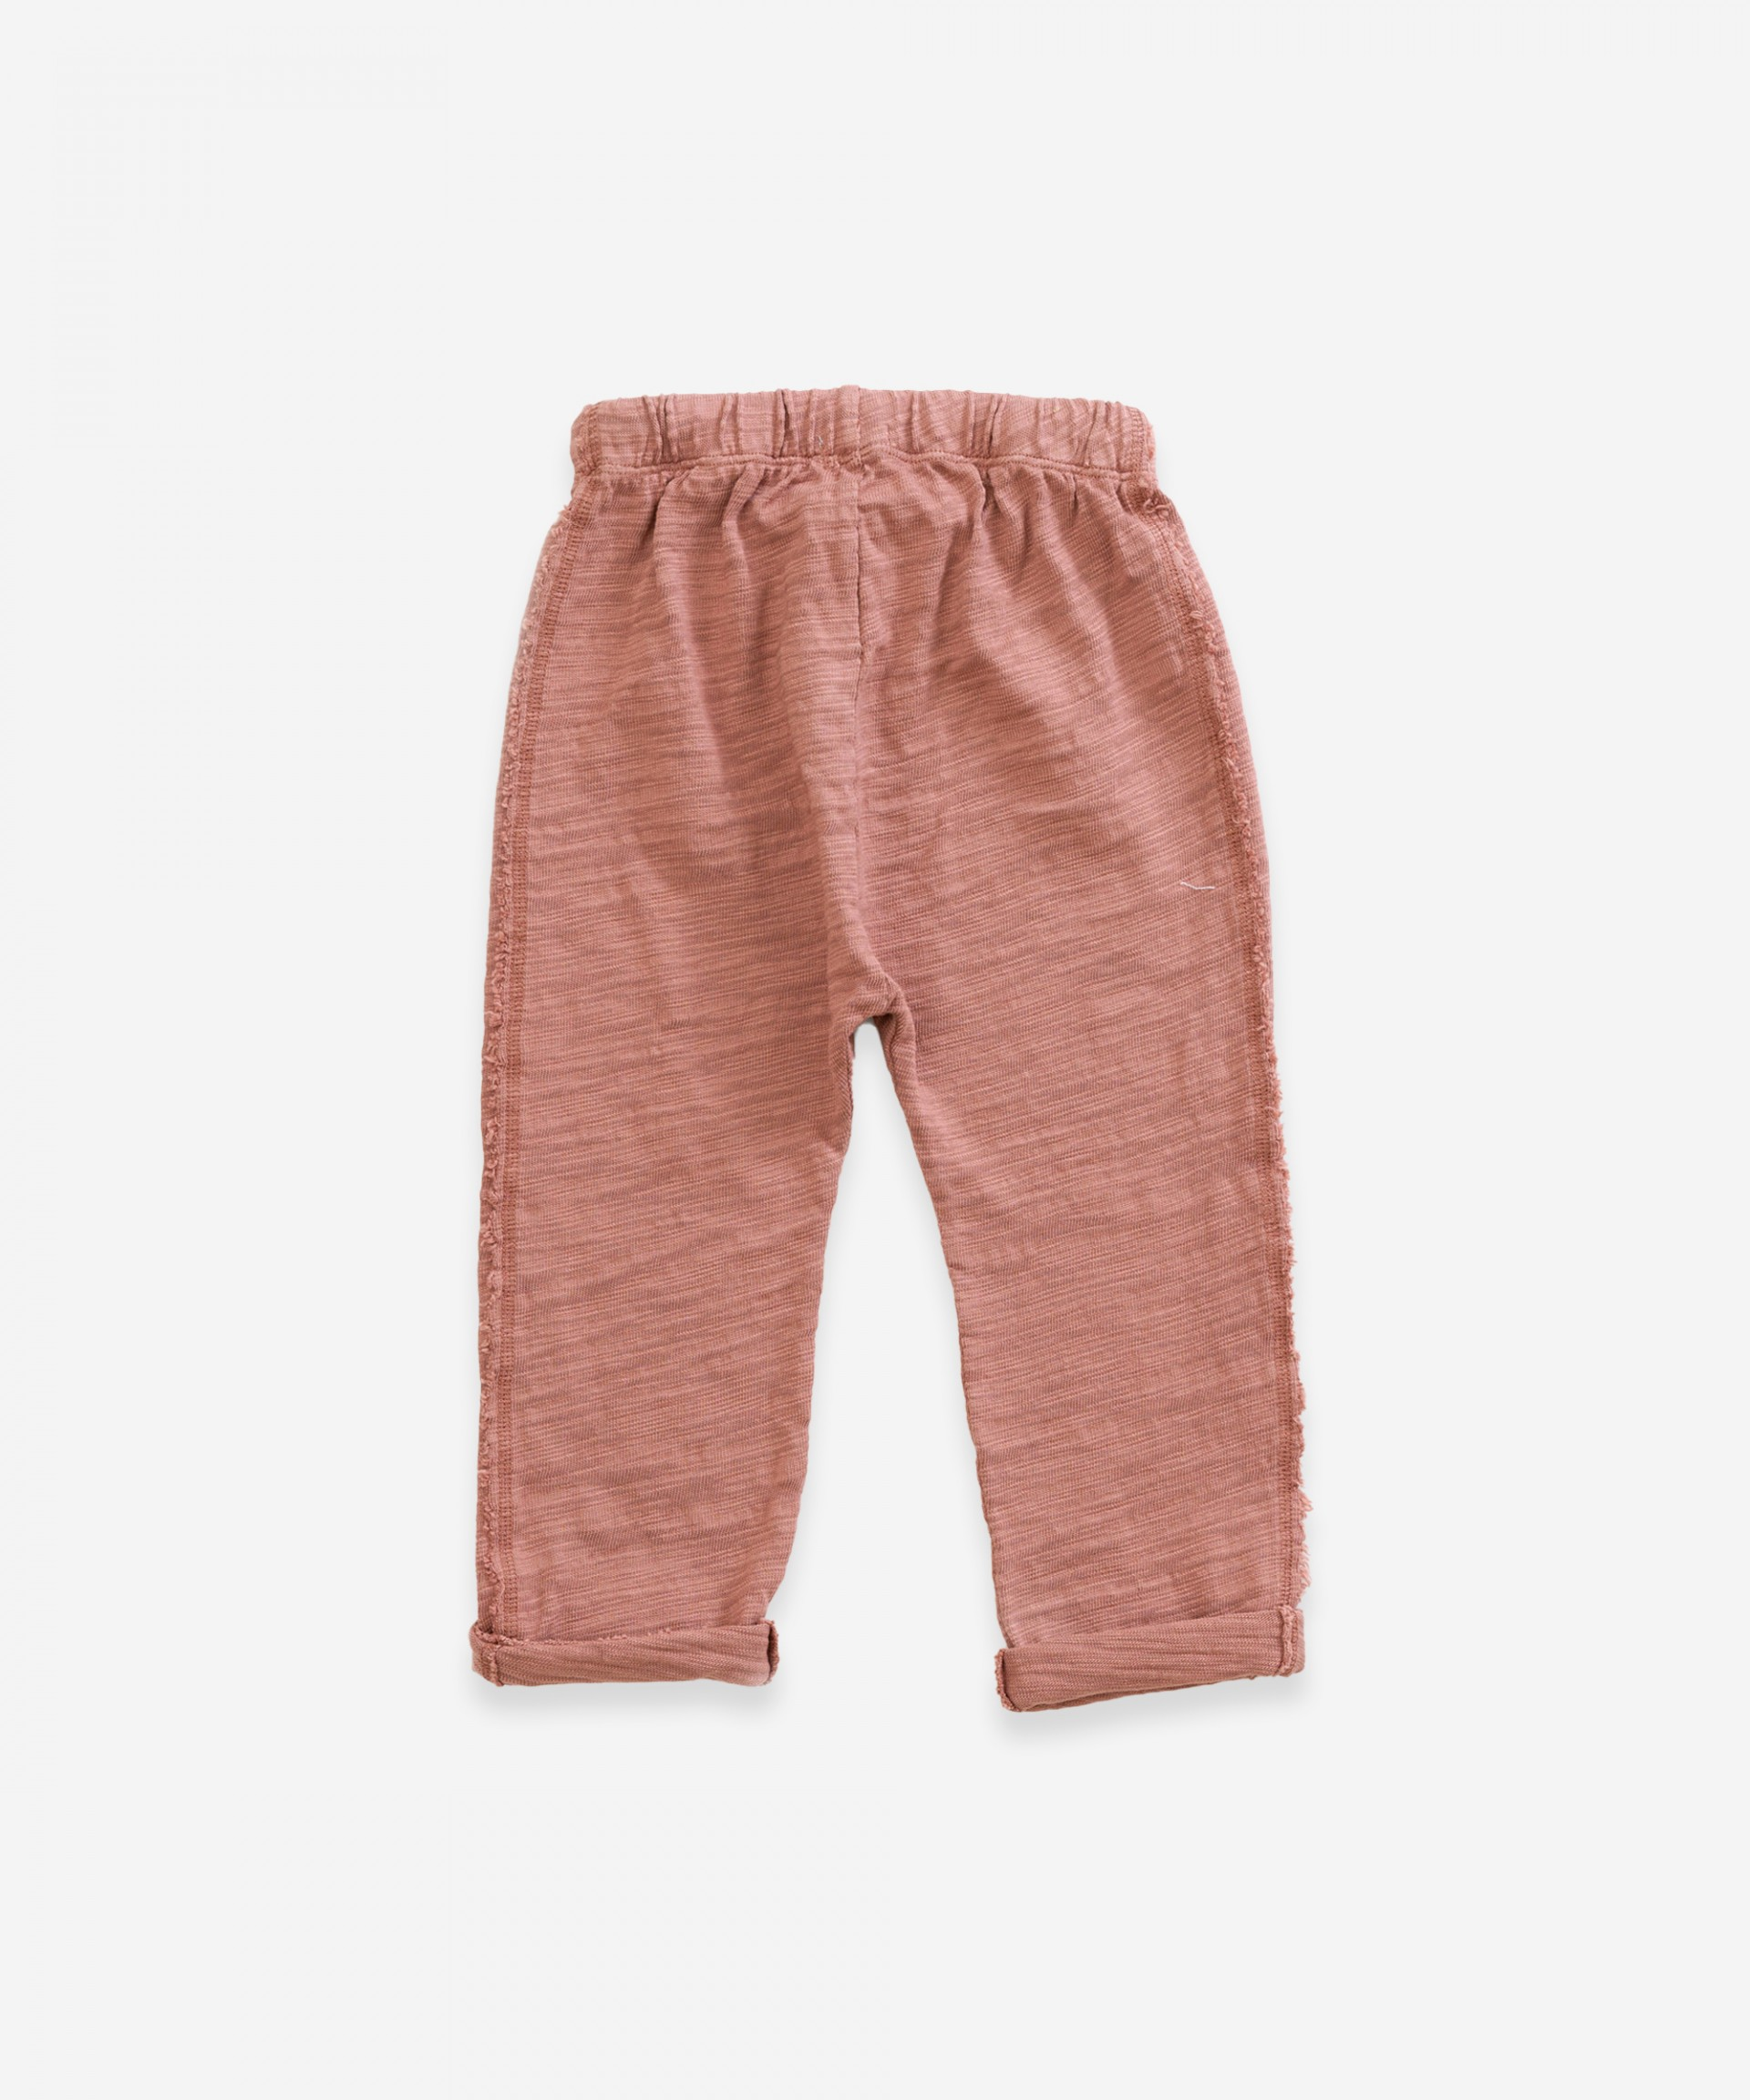 Cotton trousers | Weaving